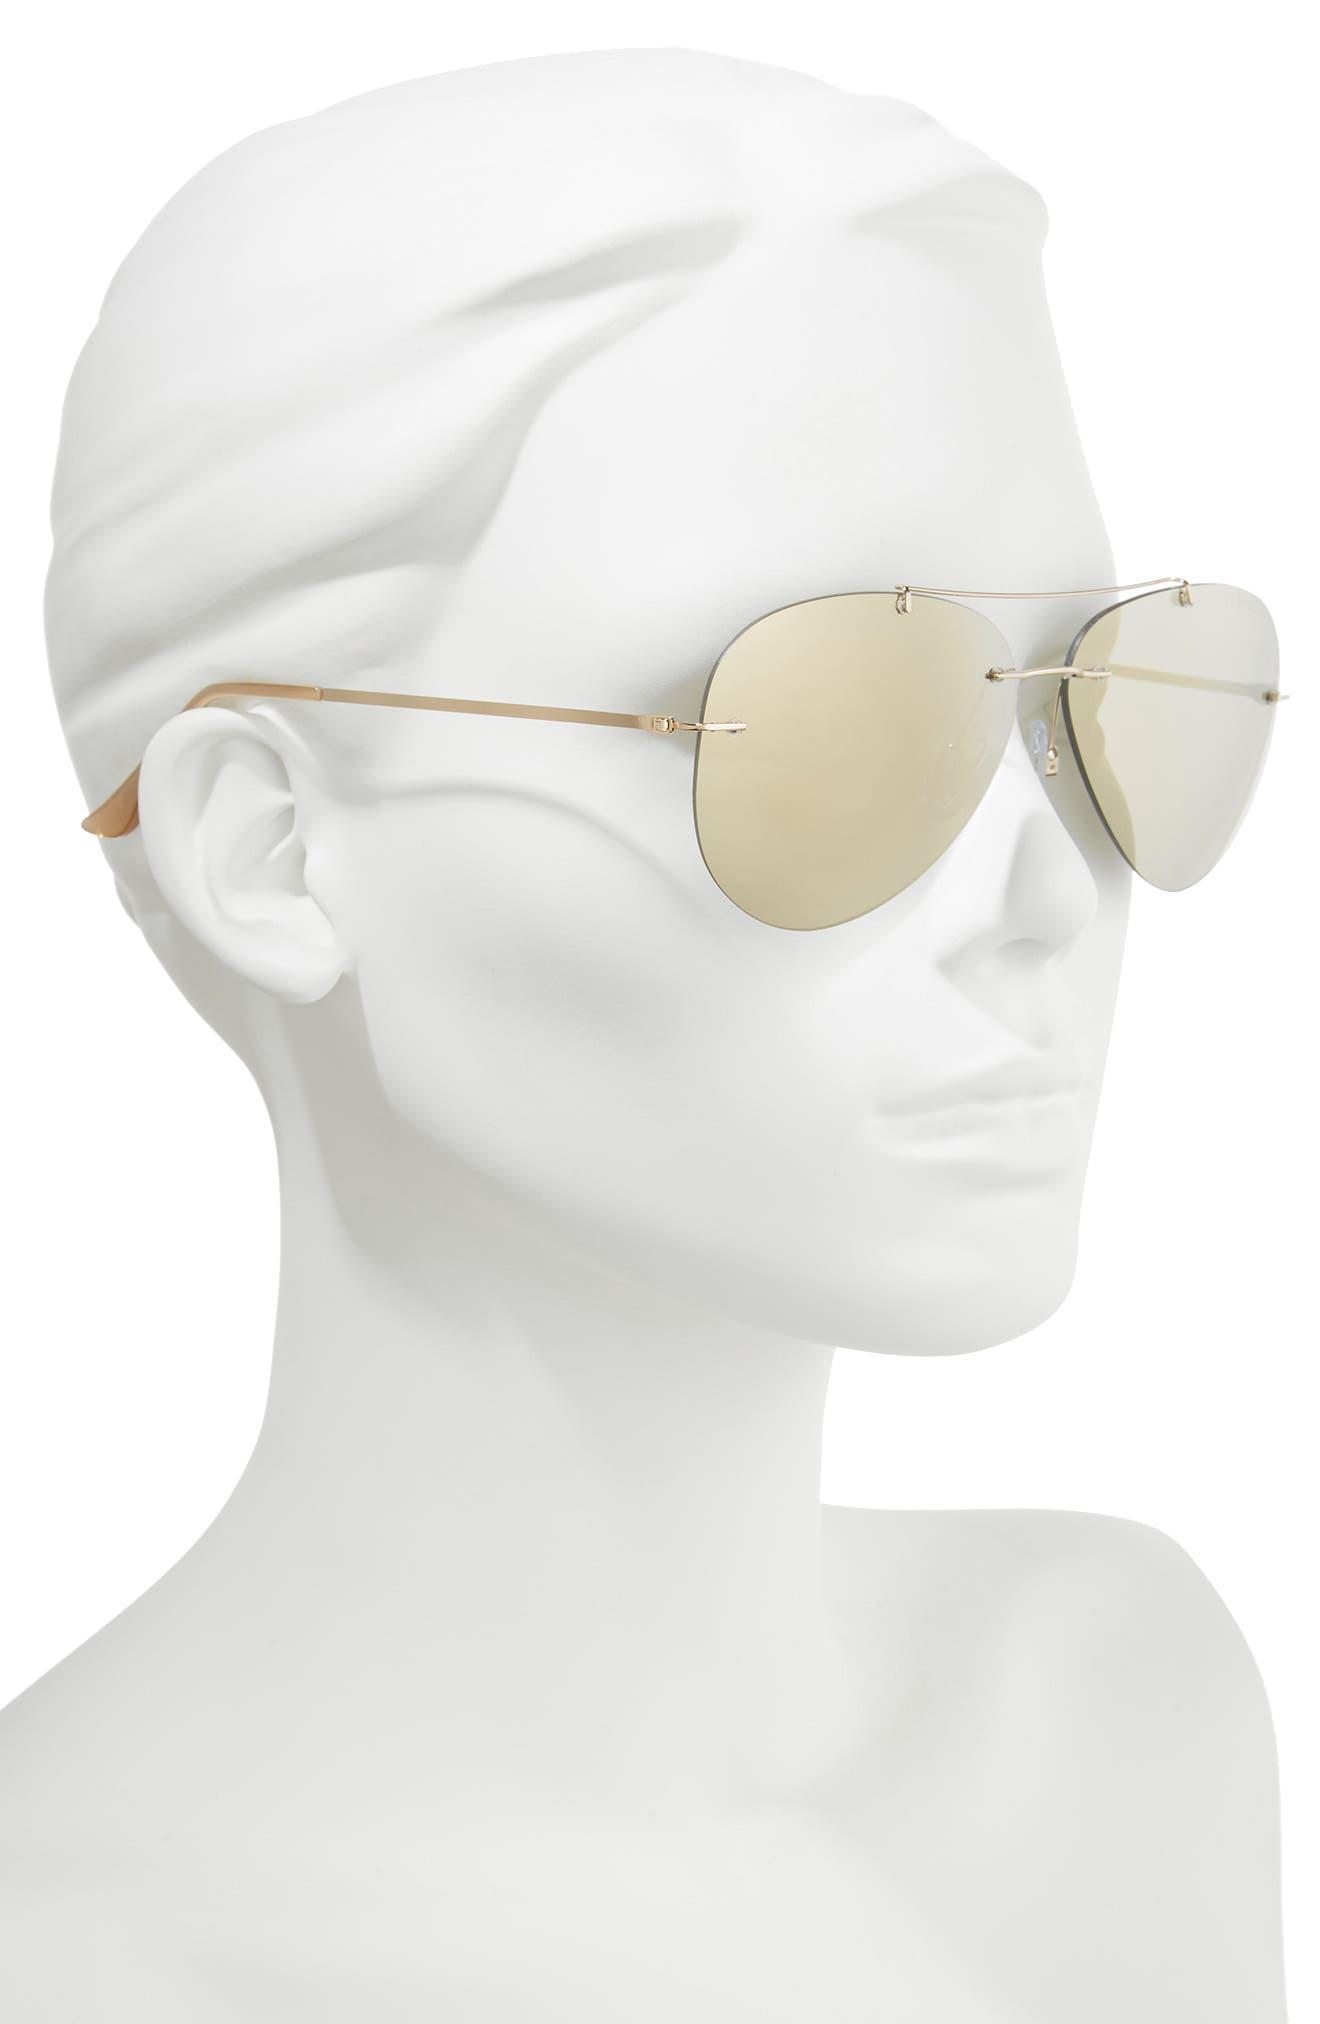 SEAFOLLY,                             Redondo 61mm Rimless Aviator Sunglasses,                             Alternate thumbnail 2, color,                             710